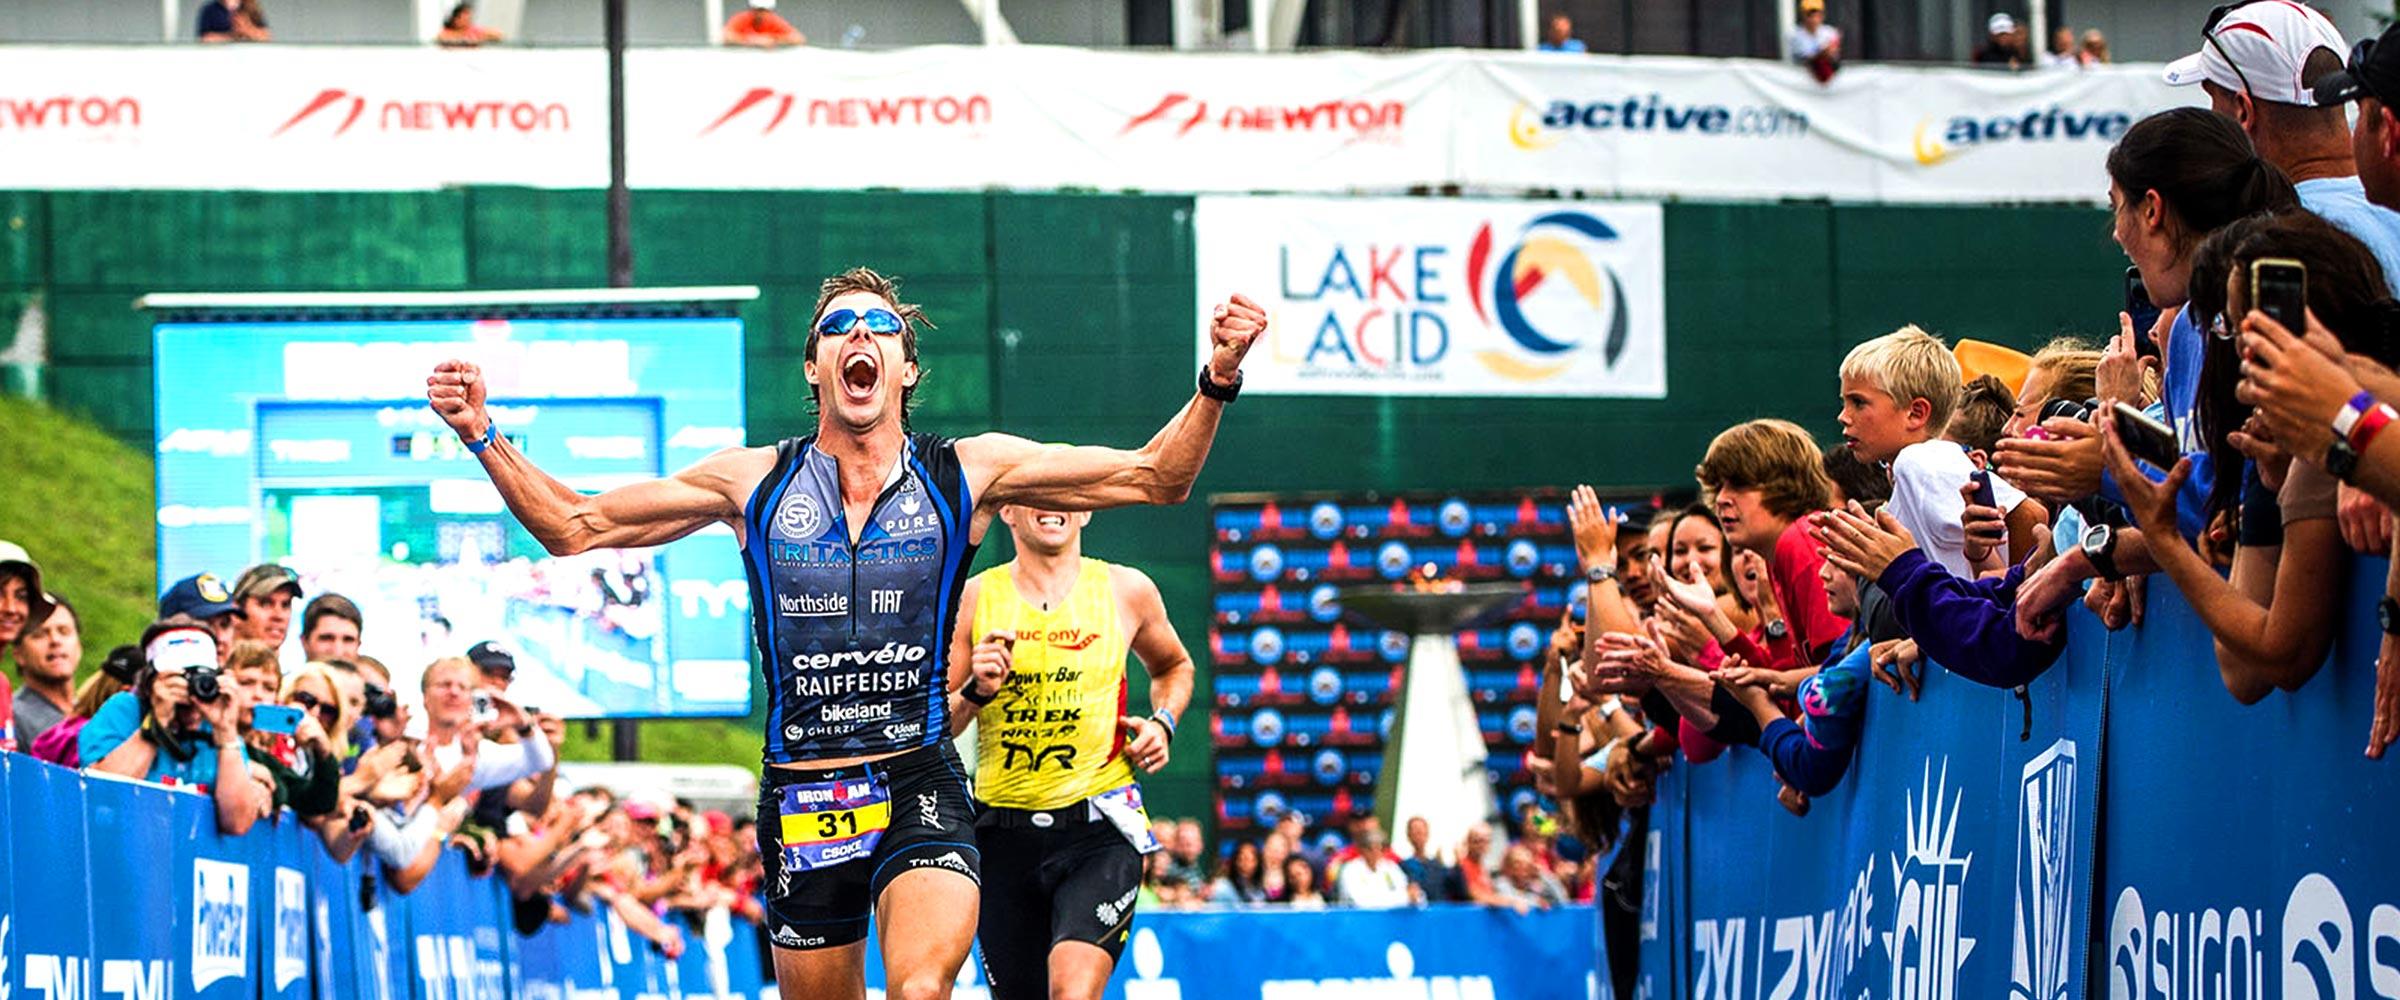 Ironman Lake Placid | Raceatlas Within Lake Placid Events 2021